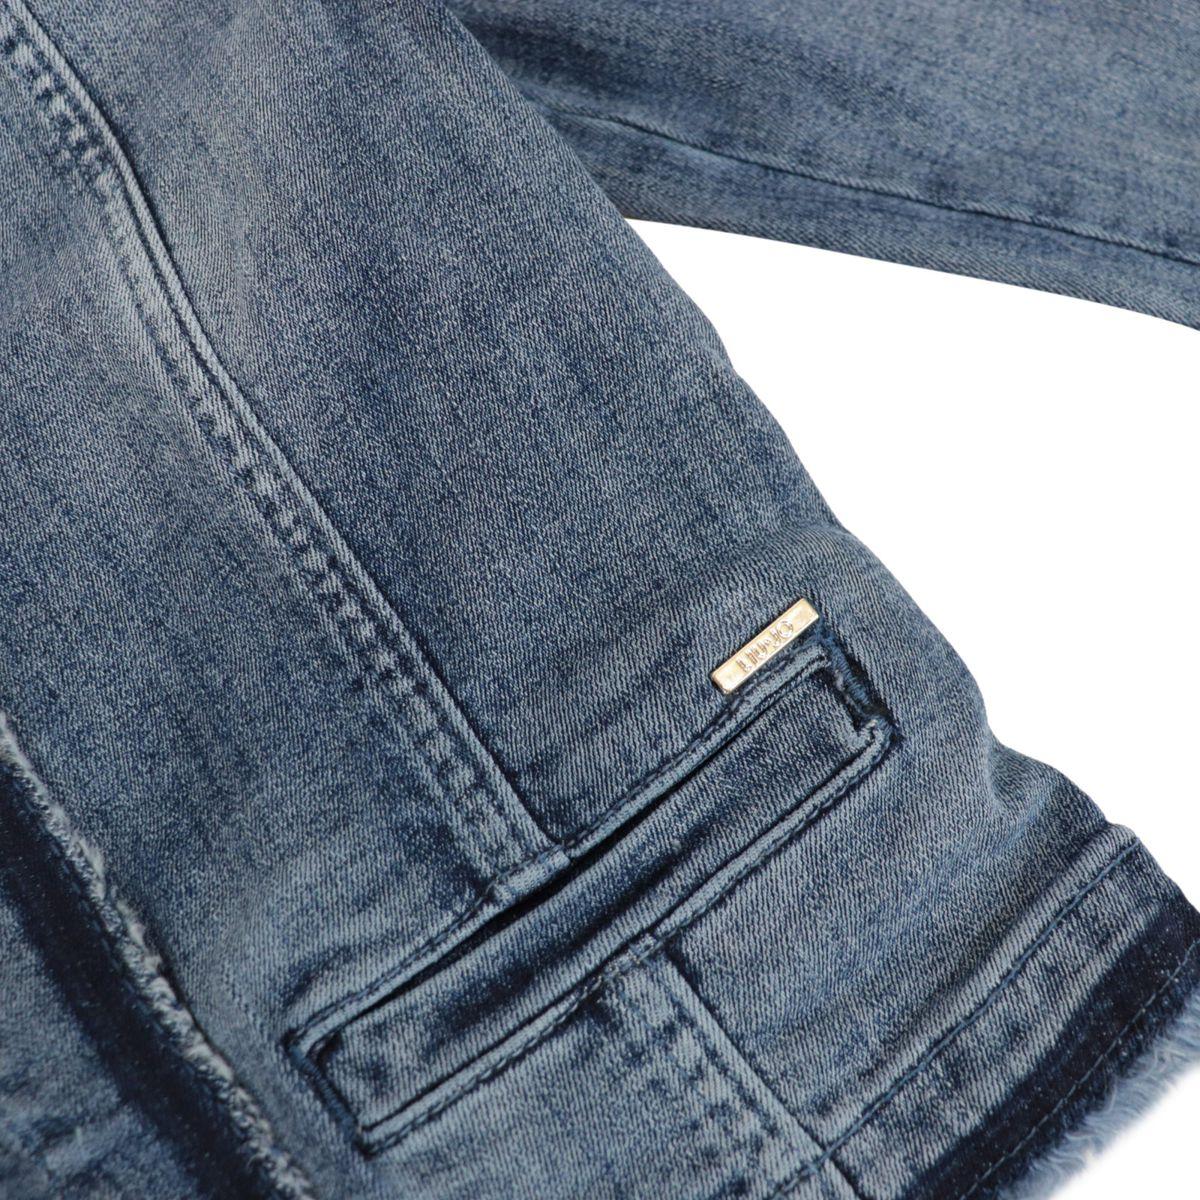 Korean denim jacket with embroidered edges Blue denim Liu Jo